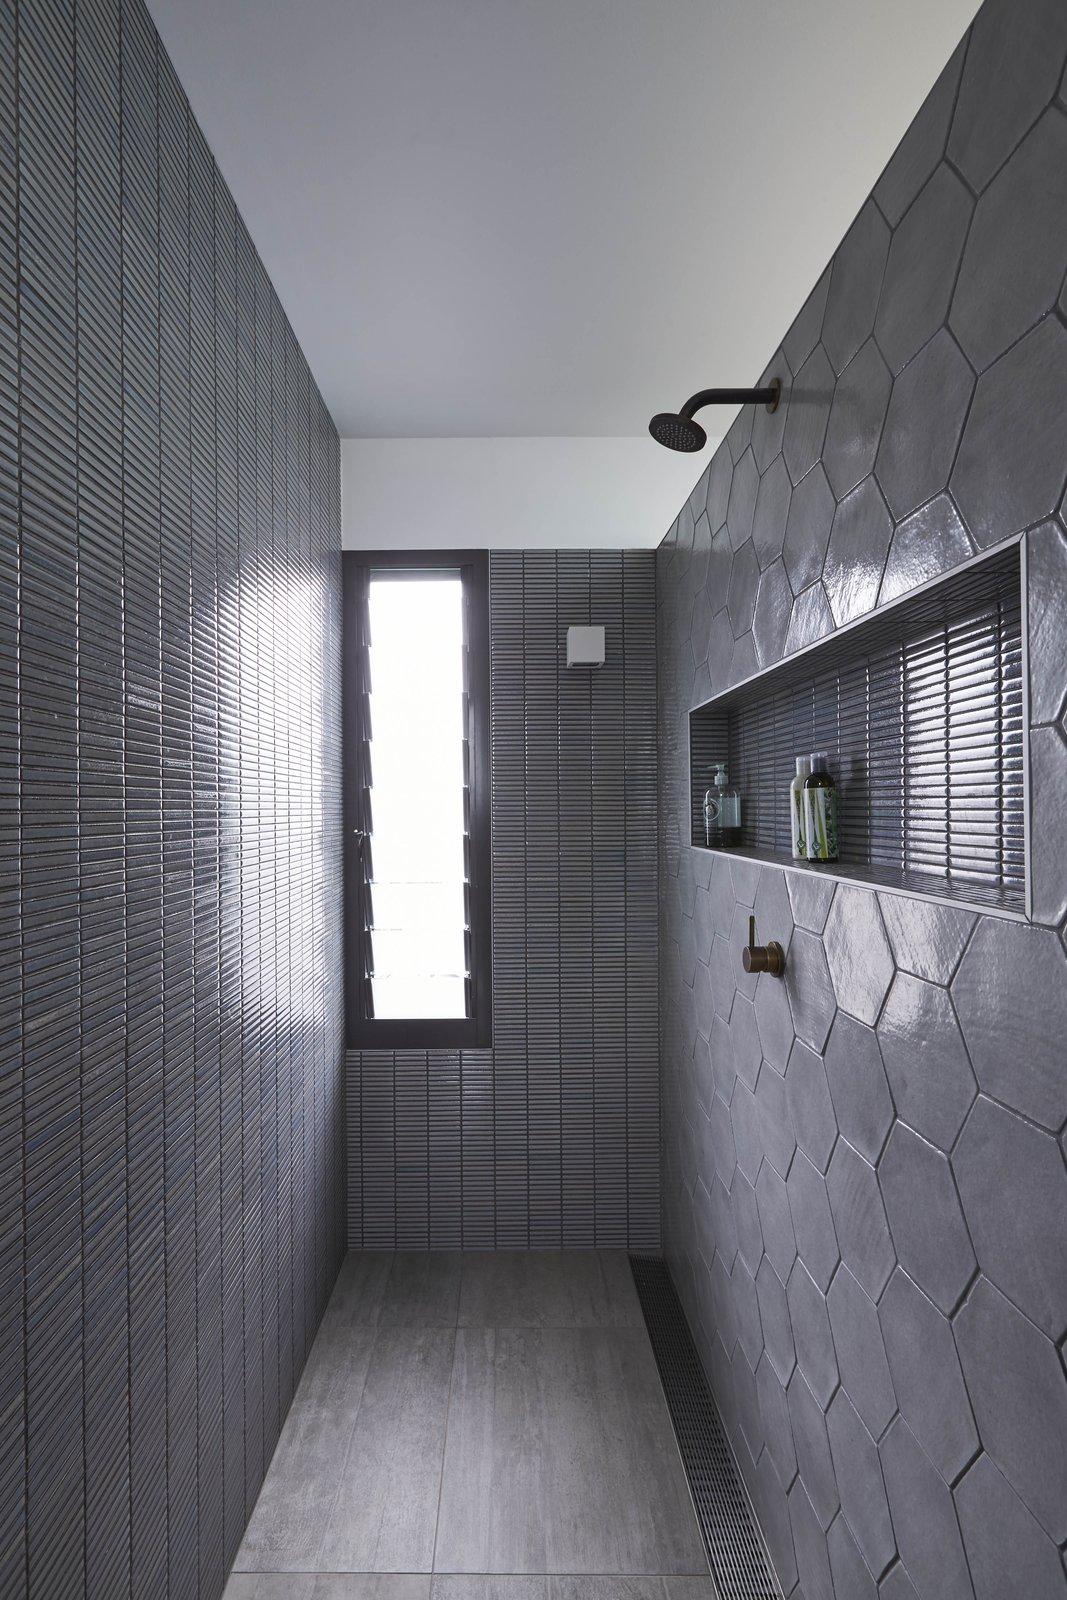 Suntrap House bathroom with gray tile